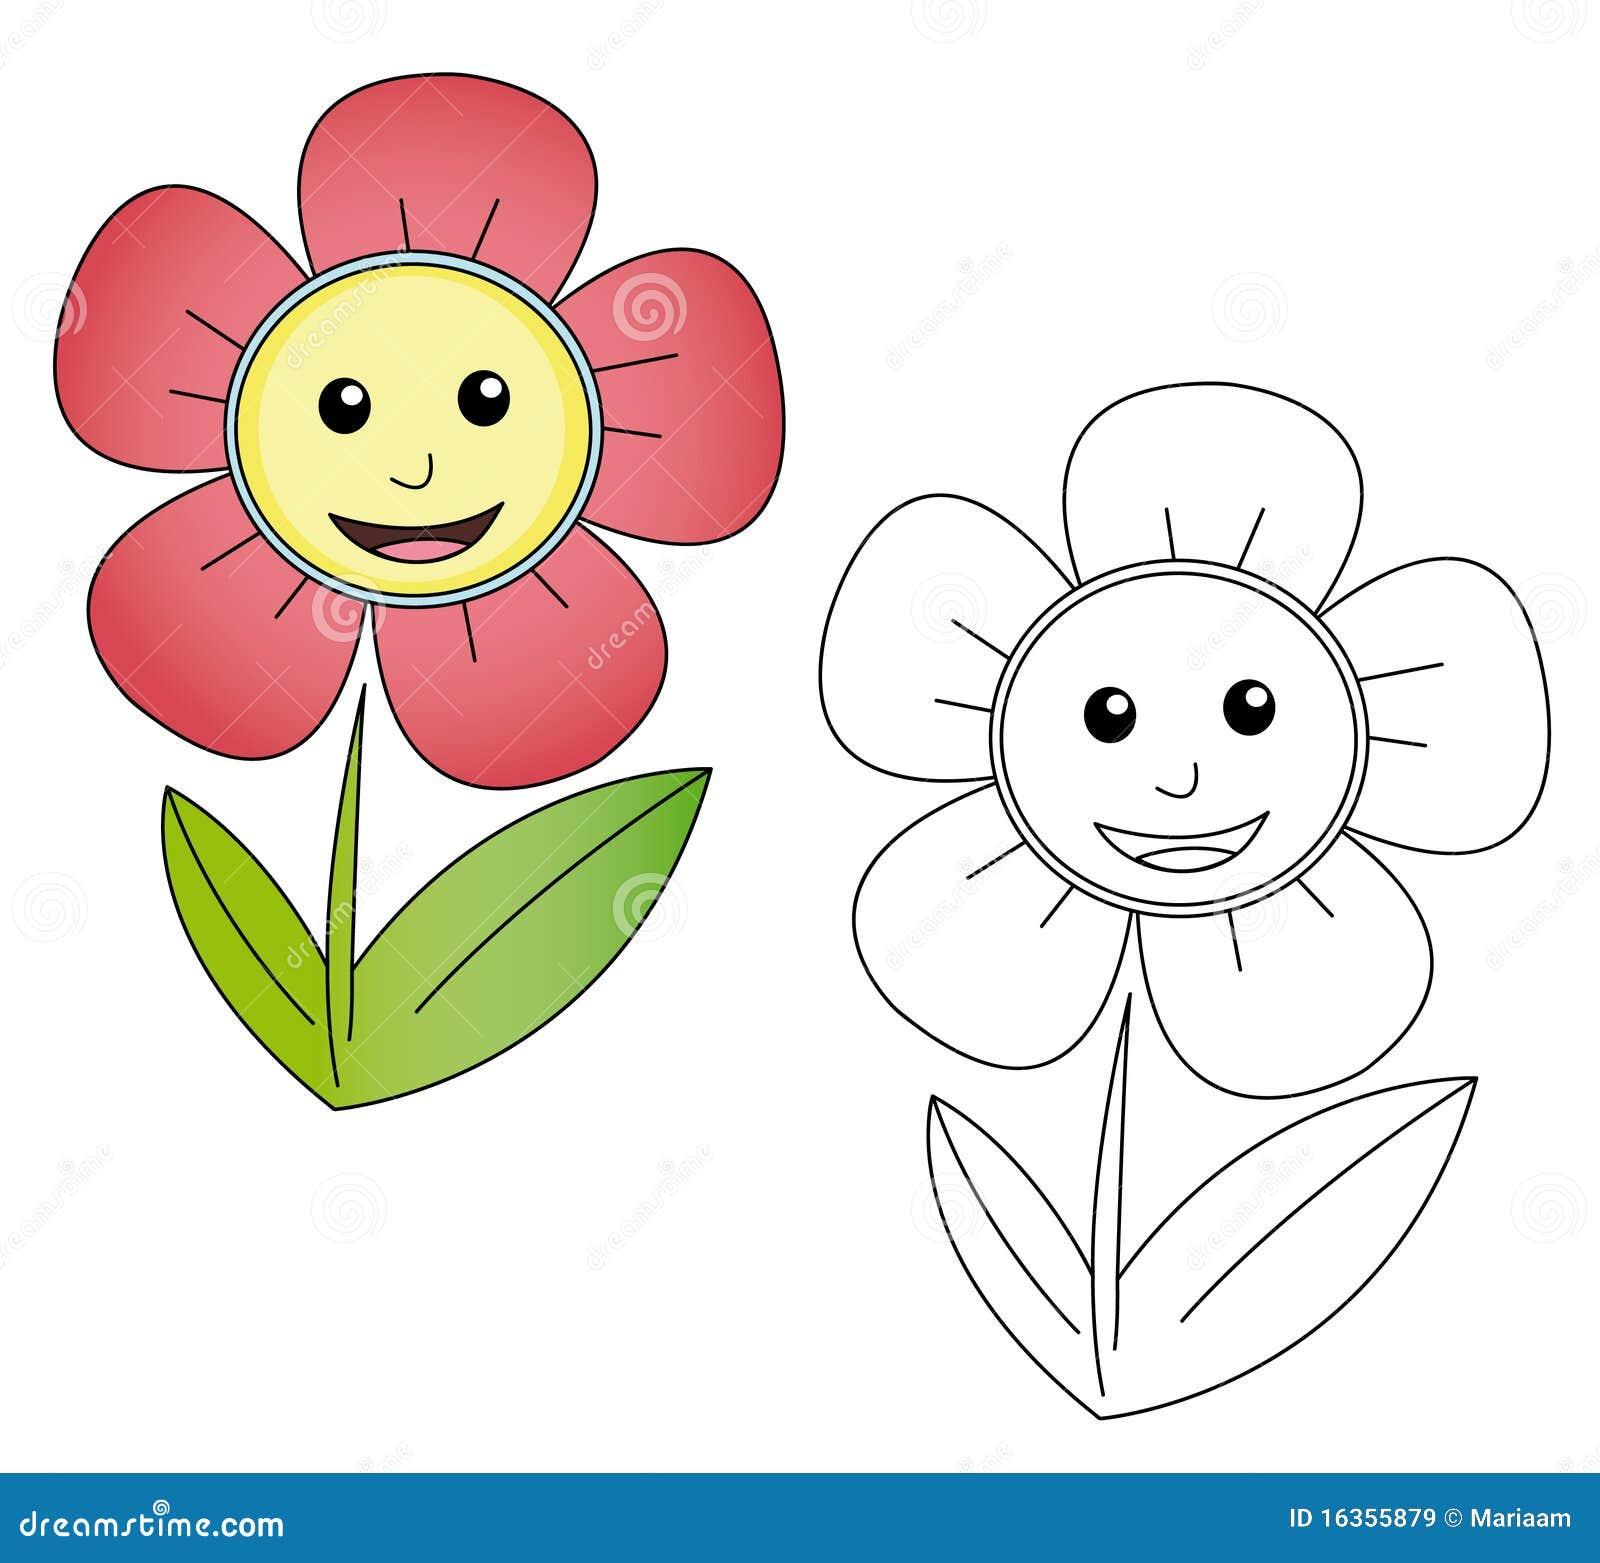 Flower Cartoon Royalty Free Stock Image